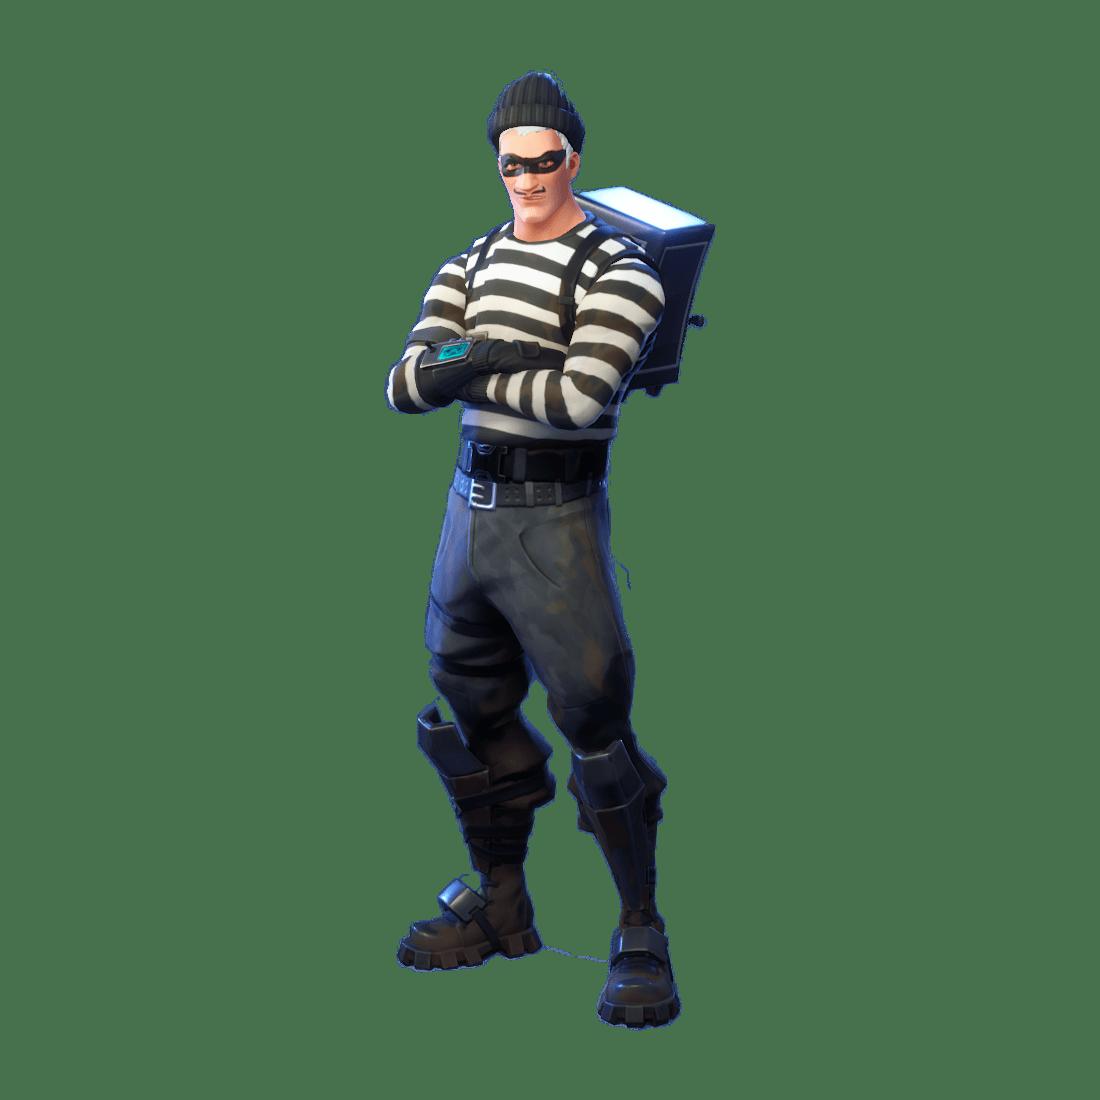 Fortnite Scoundrel Outfits   Fortnite Skins 1100x1100